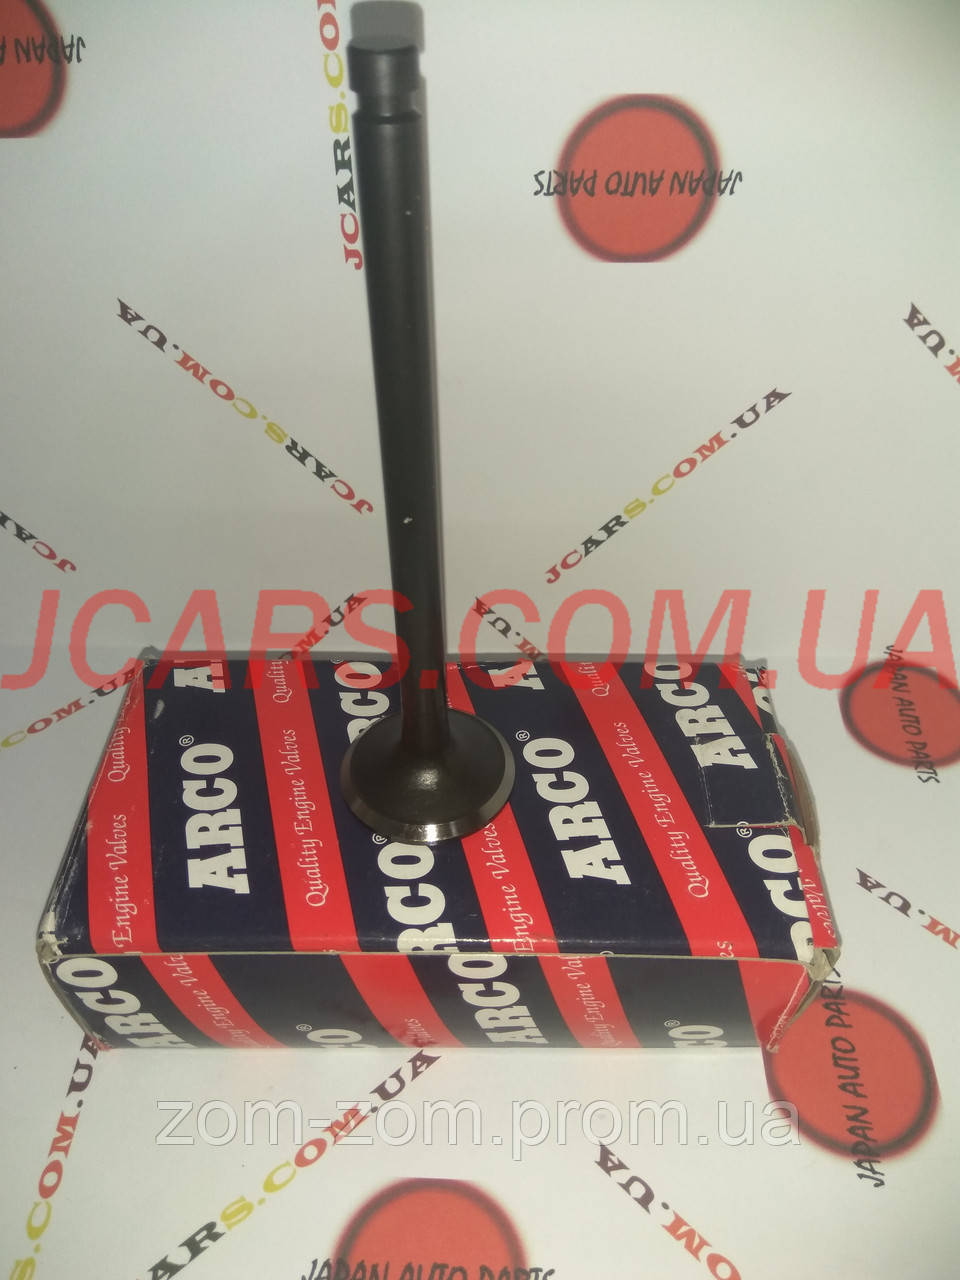 Клапан выпускной Arco Vemime 011245xN